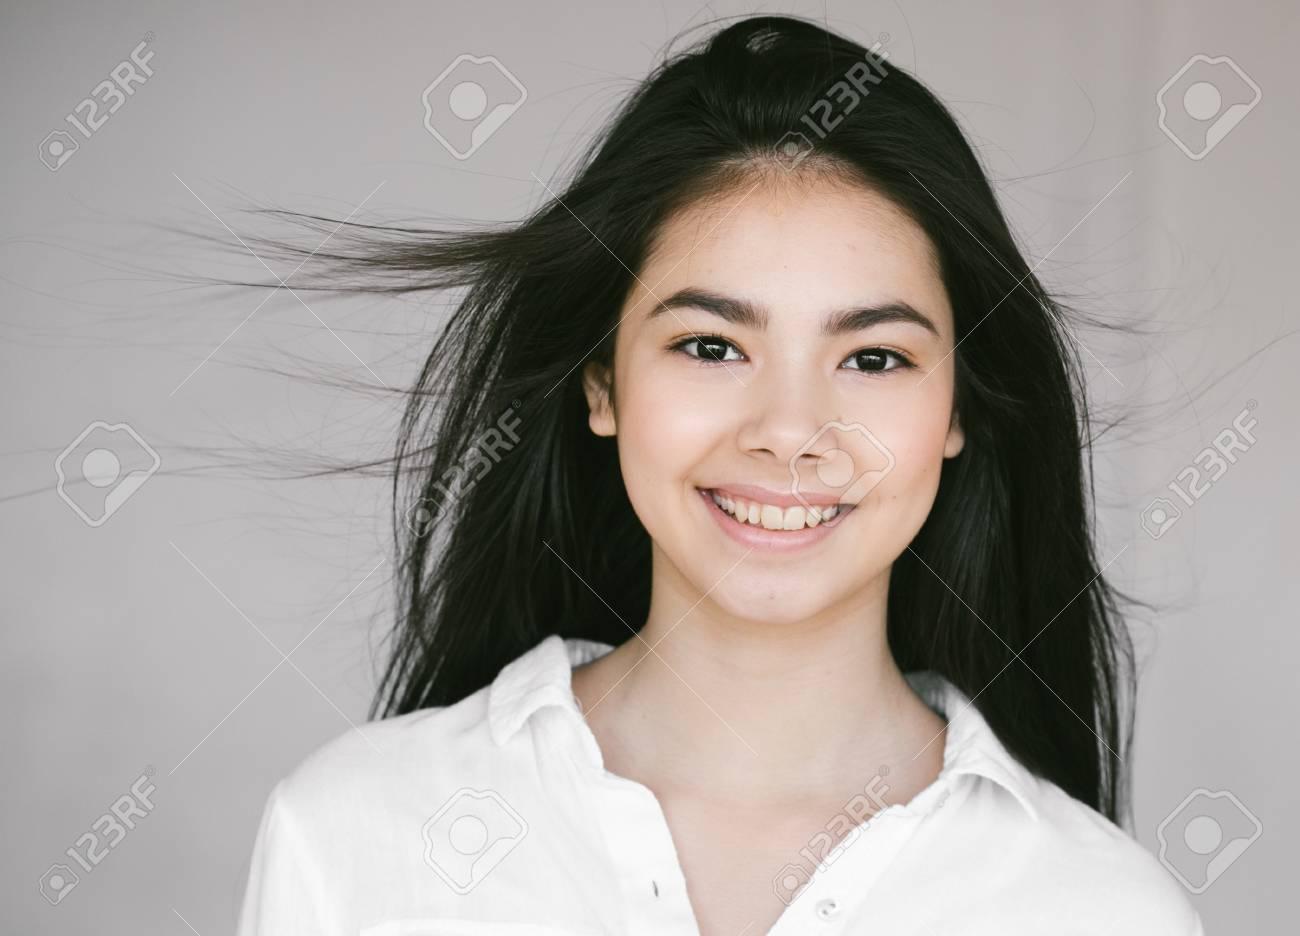 Asian woman girl beauty portrait. Studio shot. Gray background. - 79418152